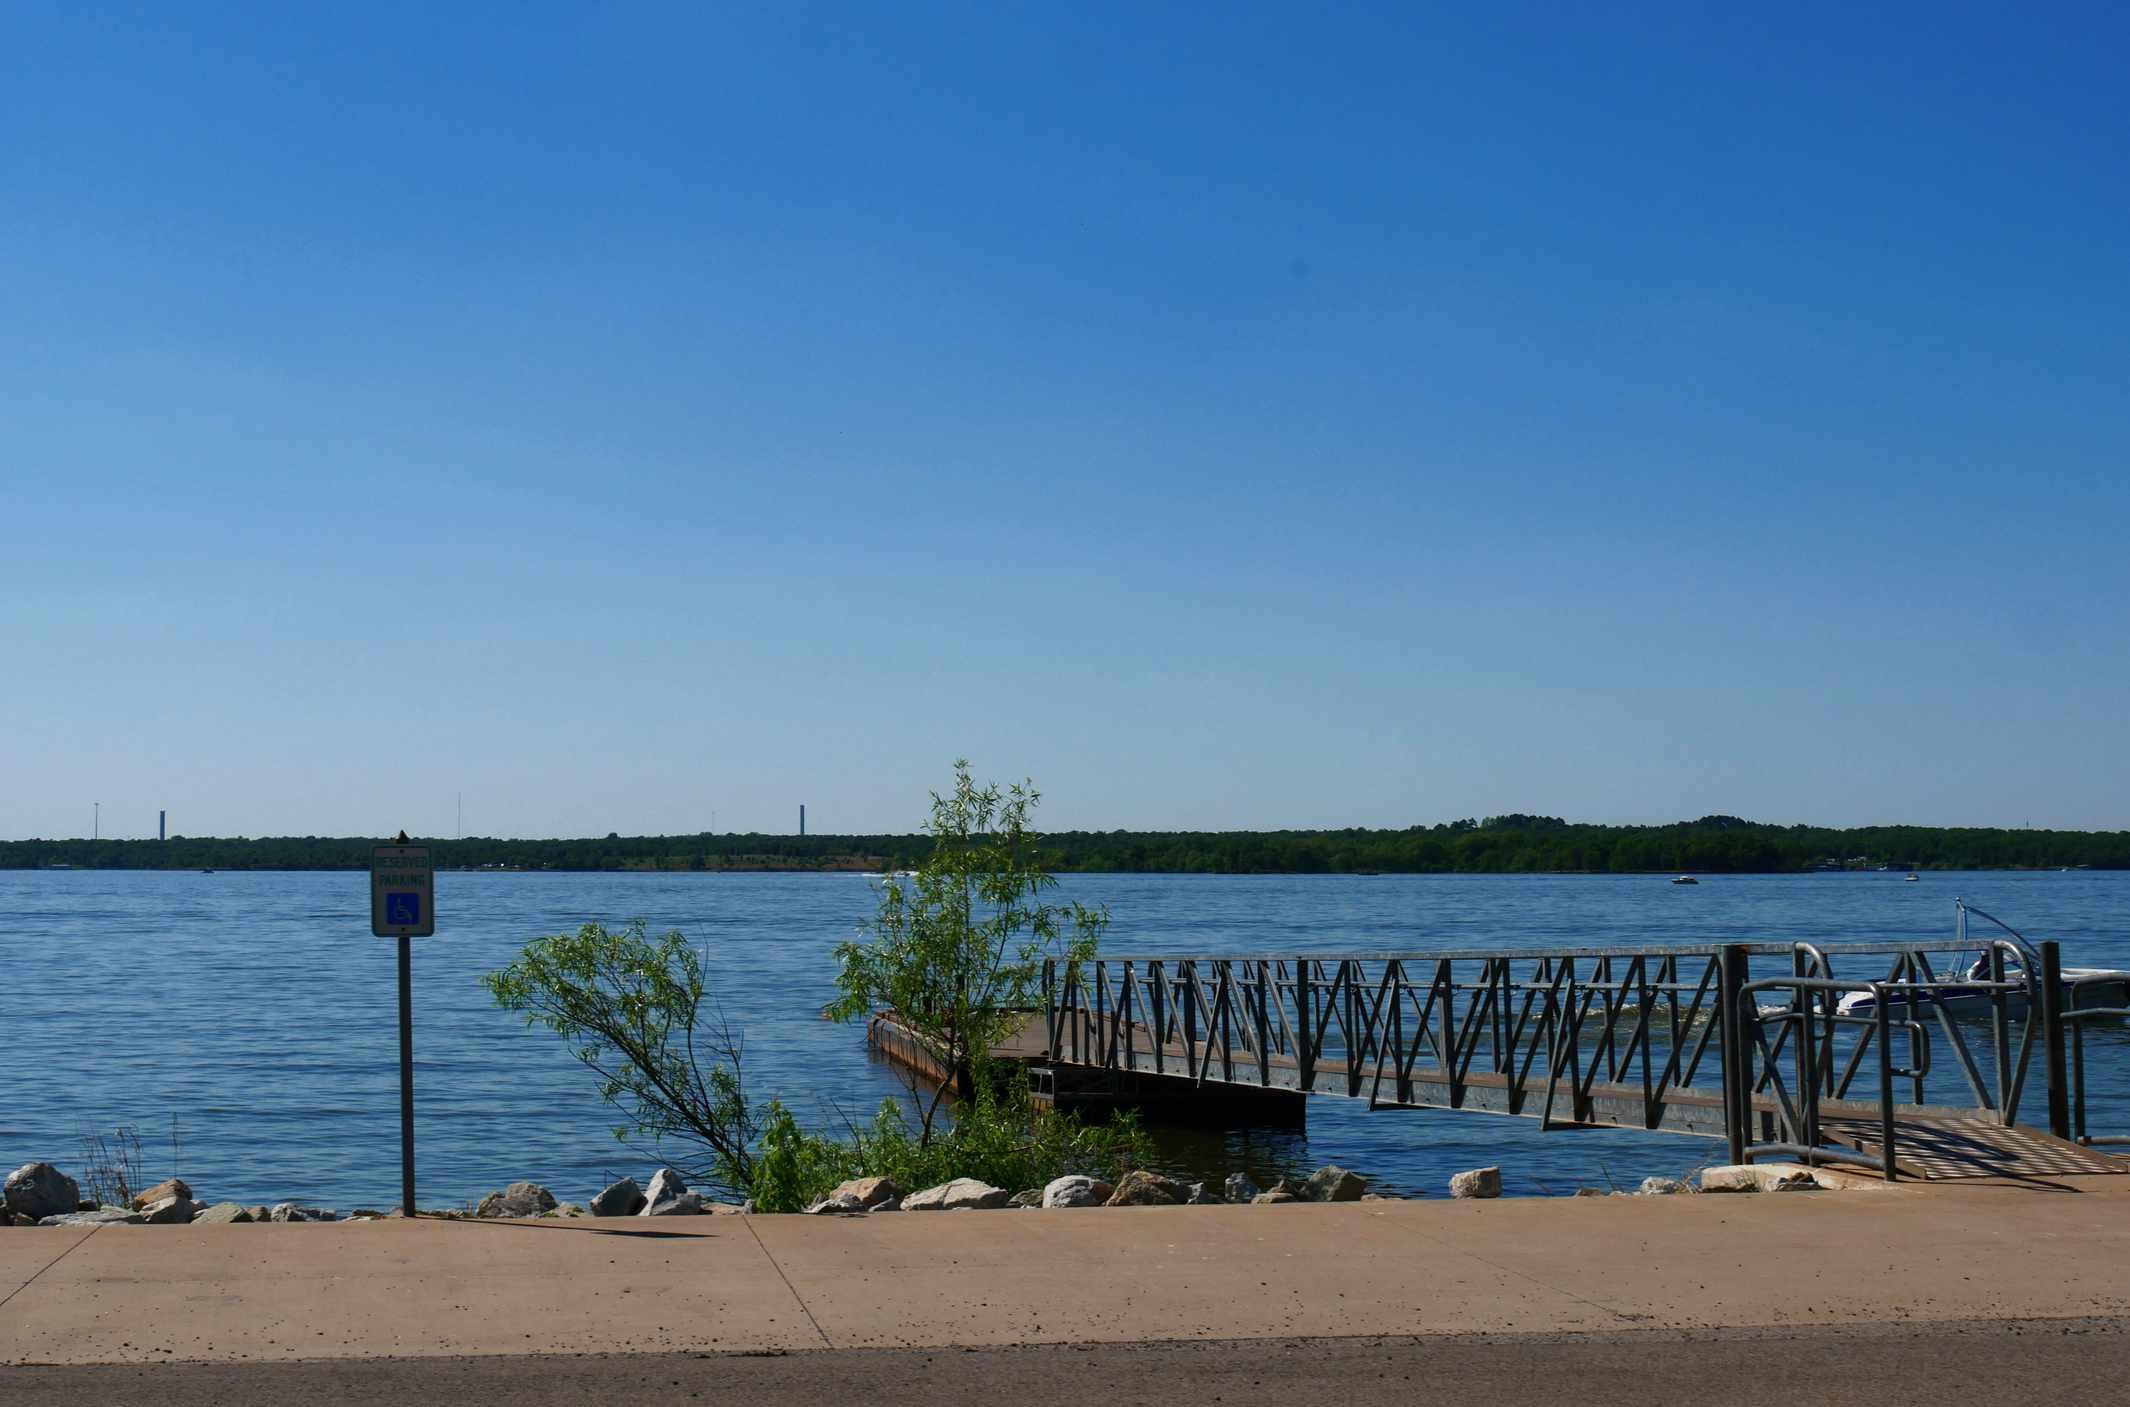 Boat dock and bridge at the Lake Thunderbird State Park